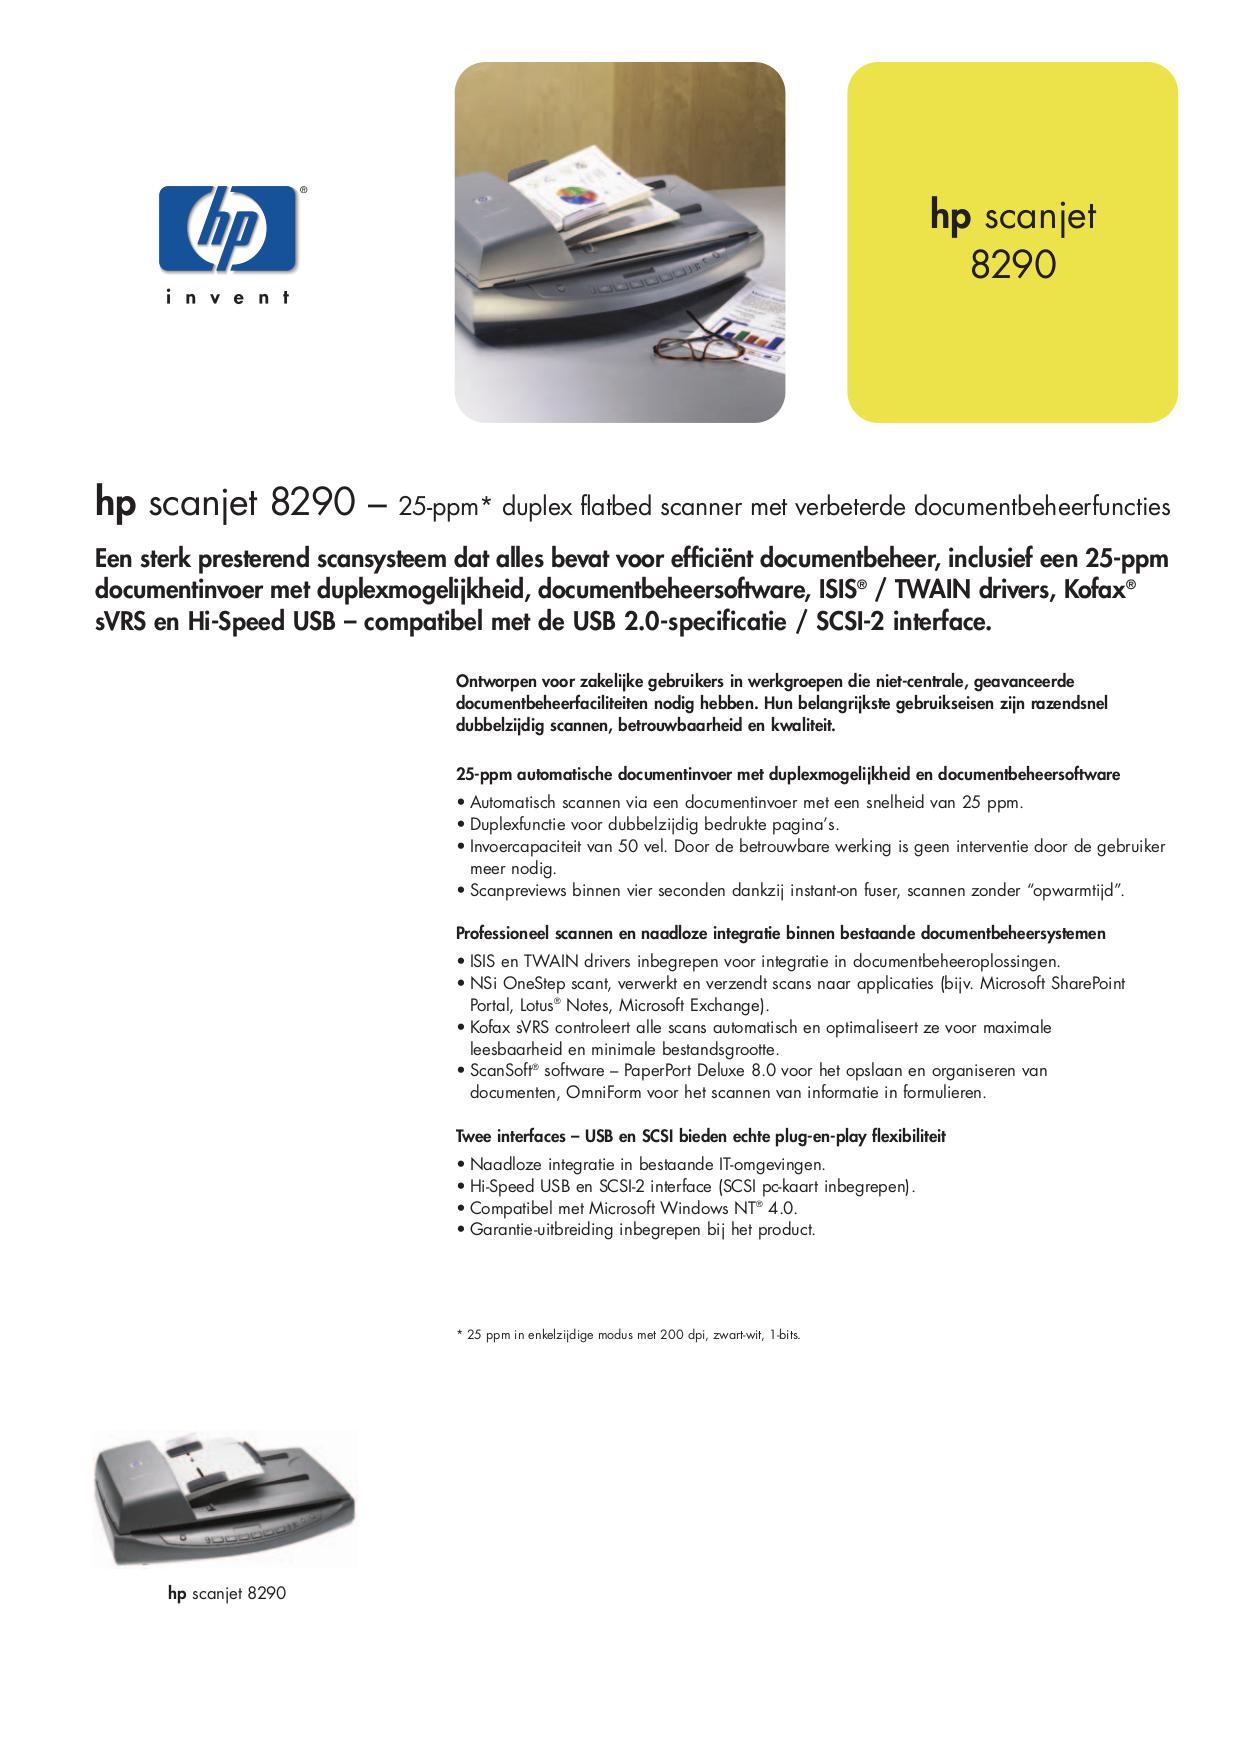 download free pdf for hp scanjet 8290 scanner manual rh umlib com HP Scanjet 3970 hp scanjet 8290 manual